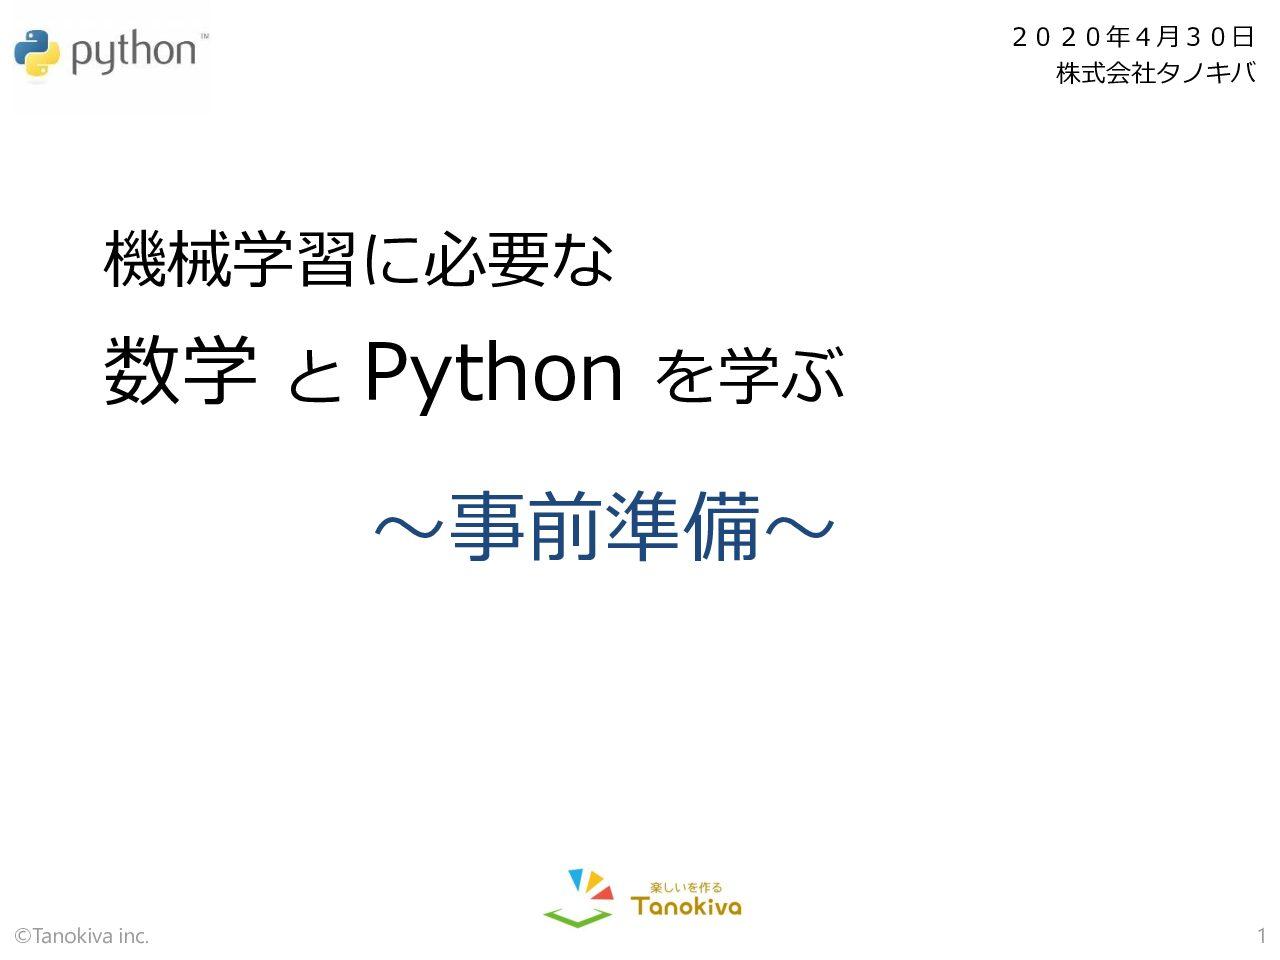 Python準備手順書(ライブラリ含む)